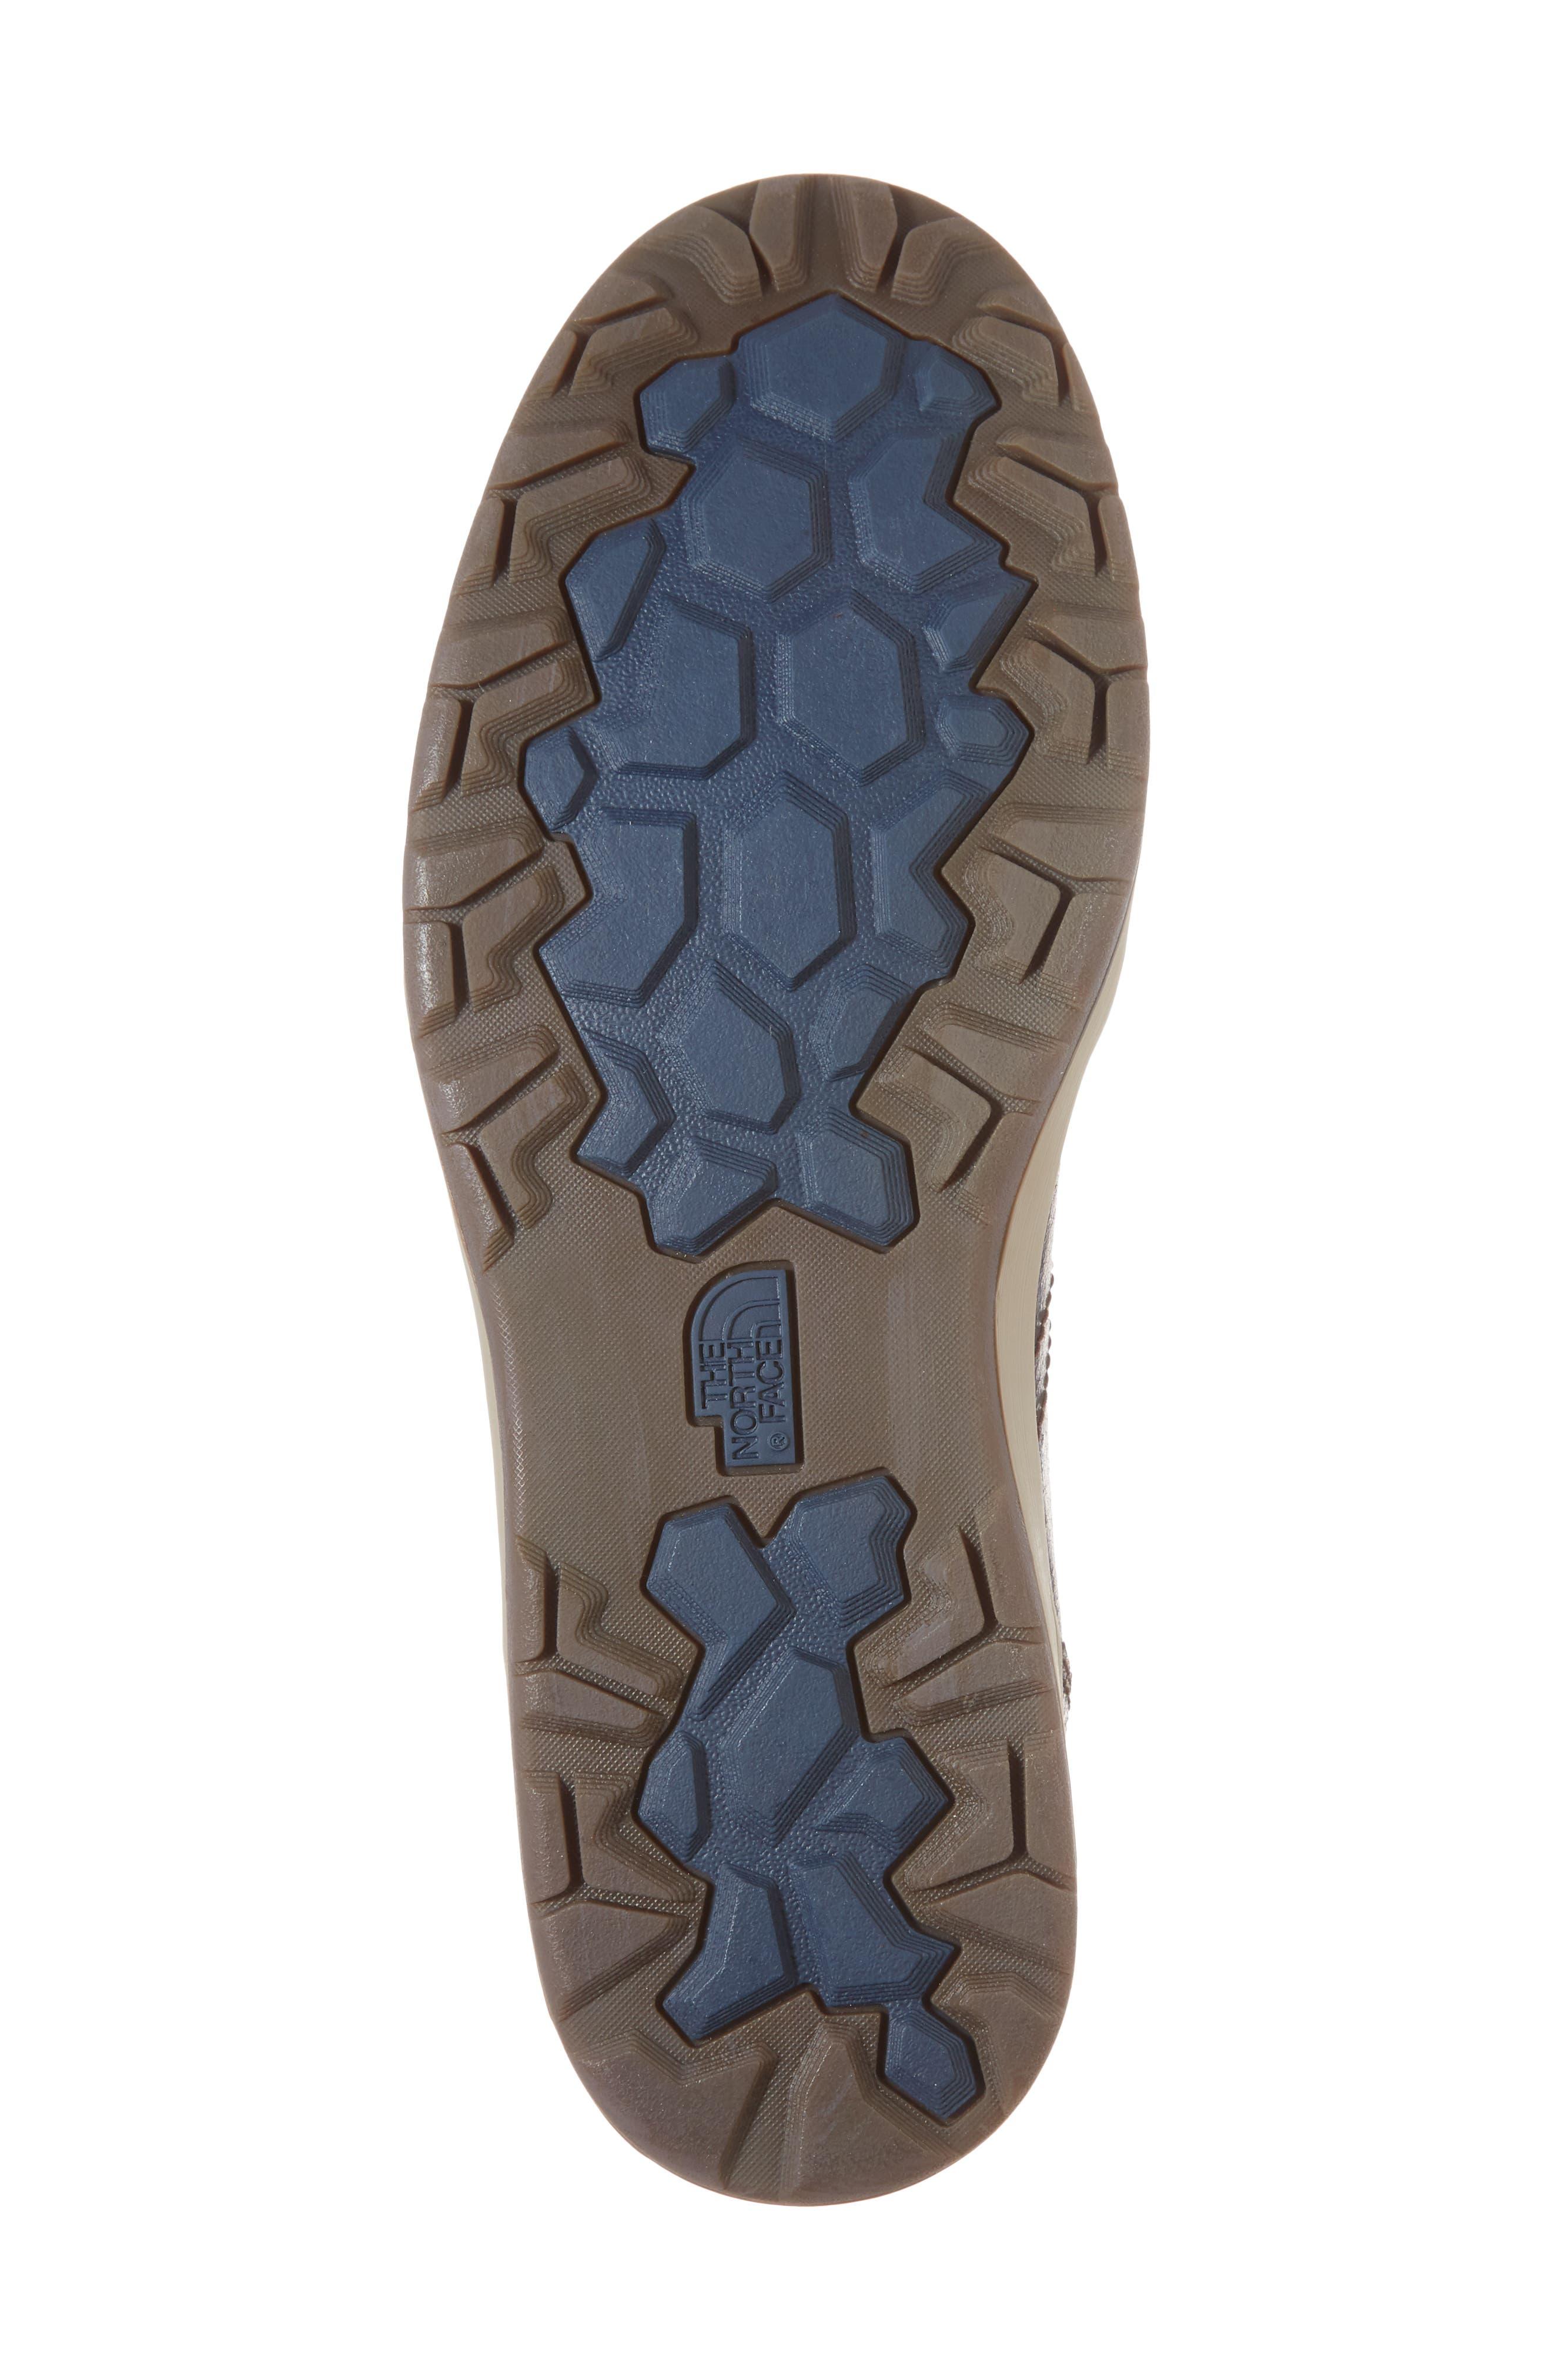 Ballard Evo Moc Toe Boot,                             Alternate thumbnail 6, color,                             Demitasse Brown